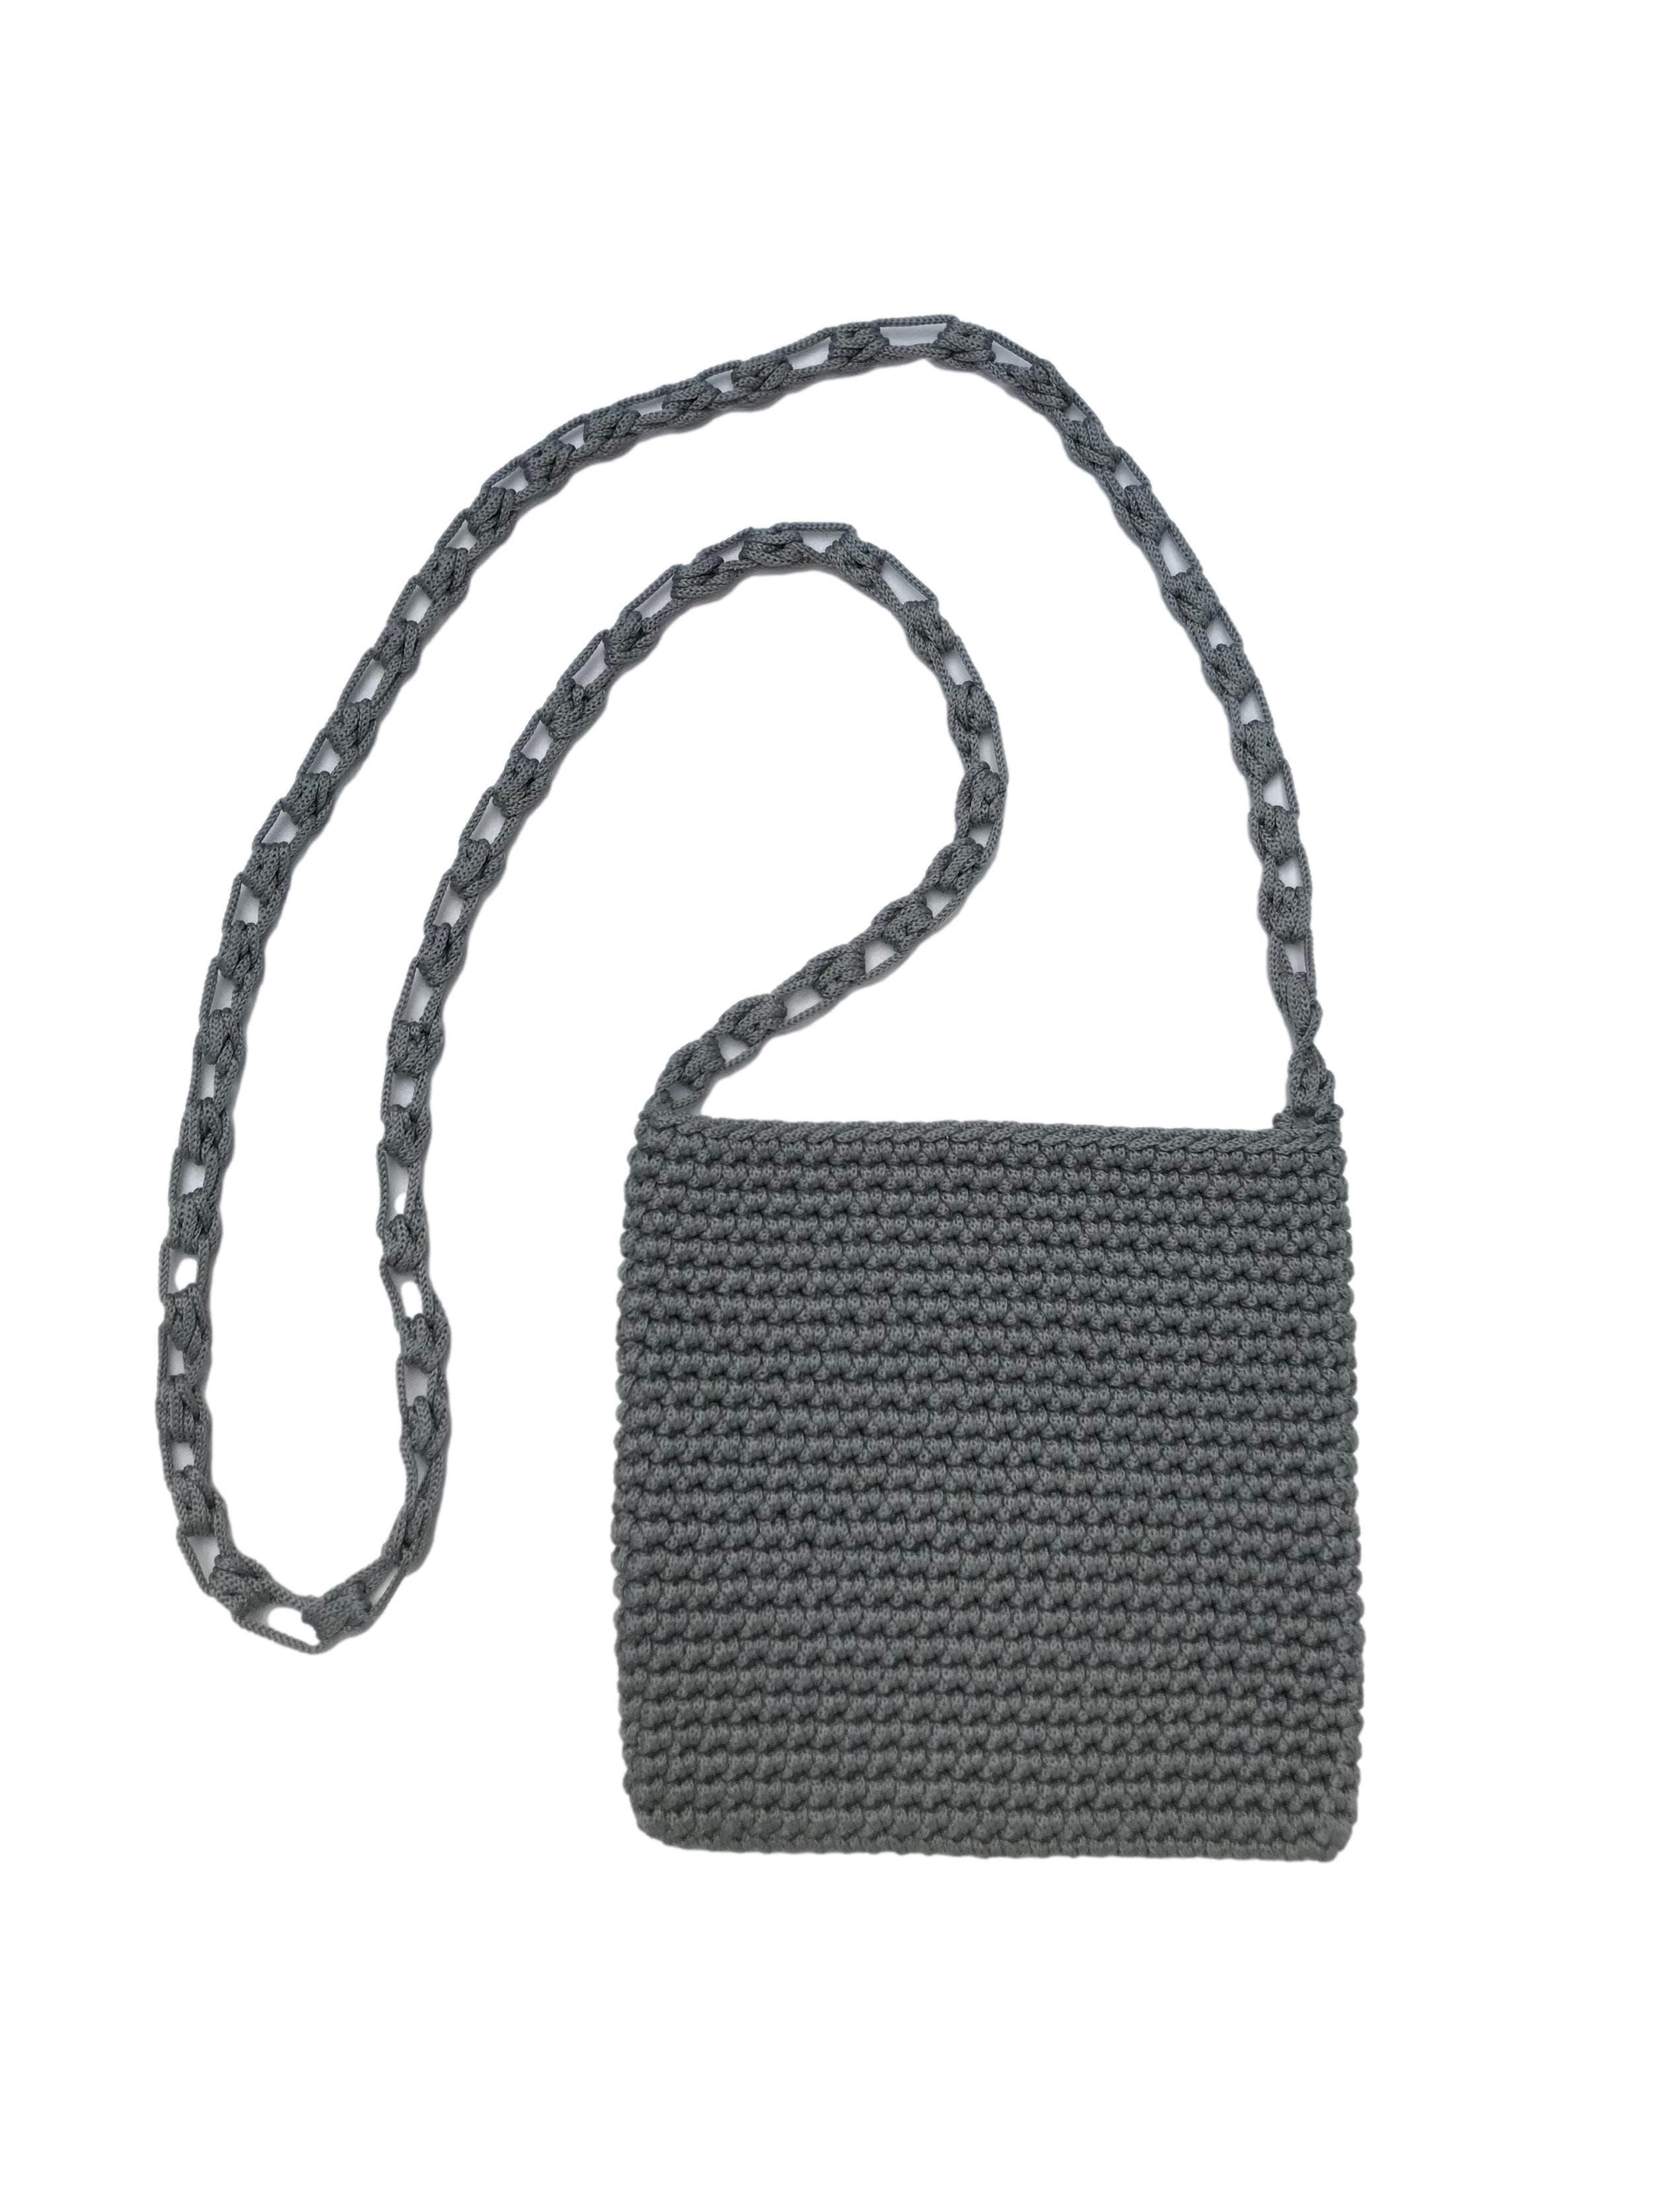 Carterita tejida a crochet gris con asa al hombro. Medidas 17x18cm